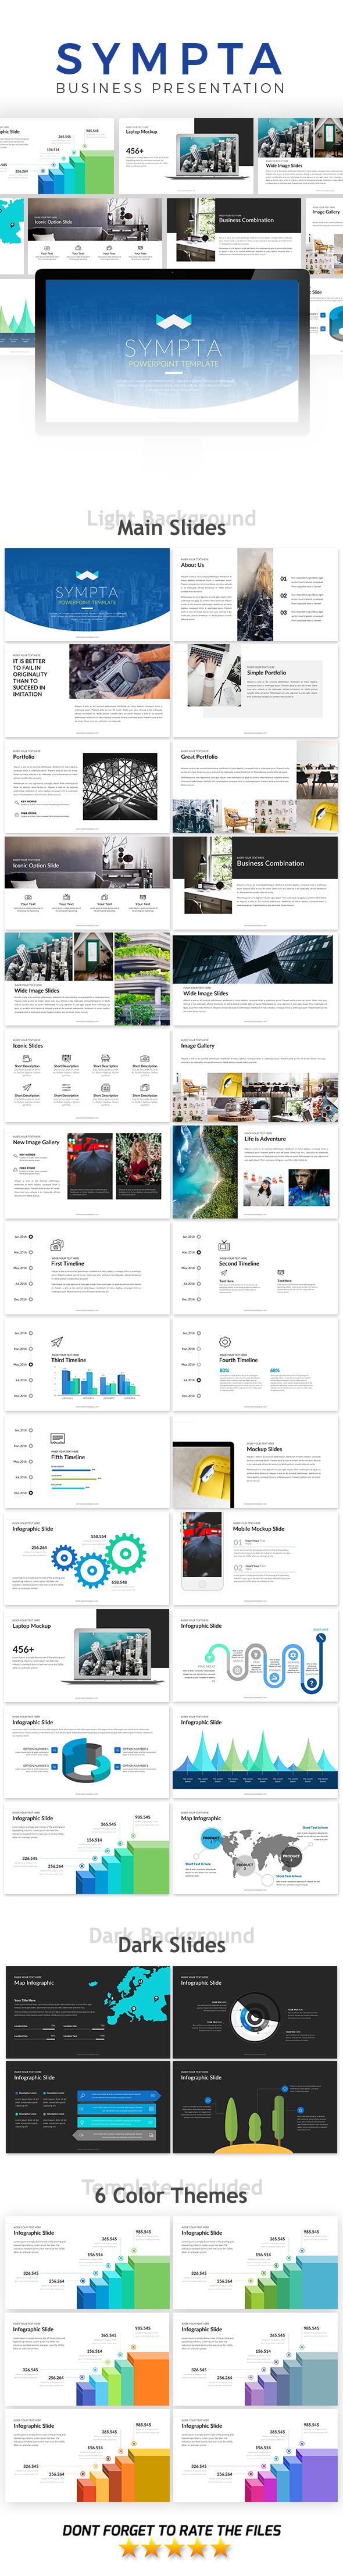 Sympta Presentation Template - Business PowerPoint Templates